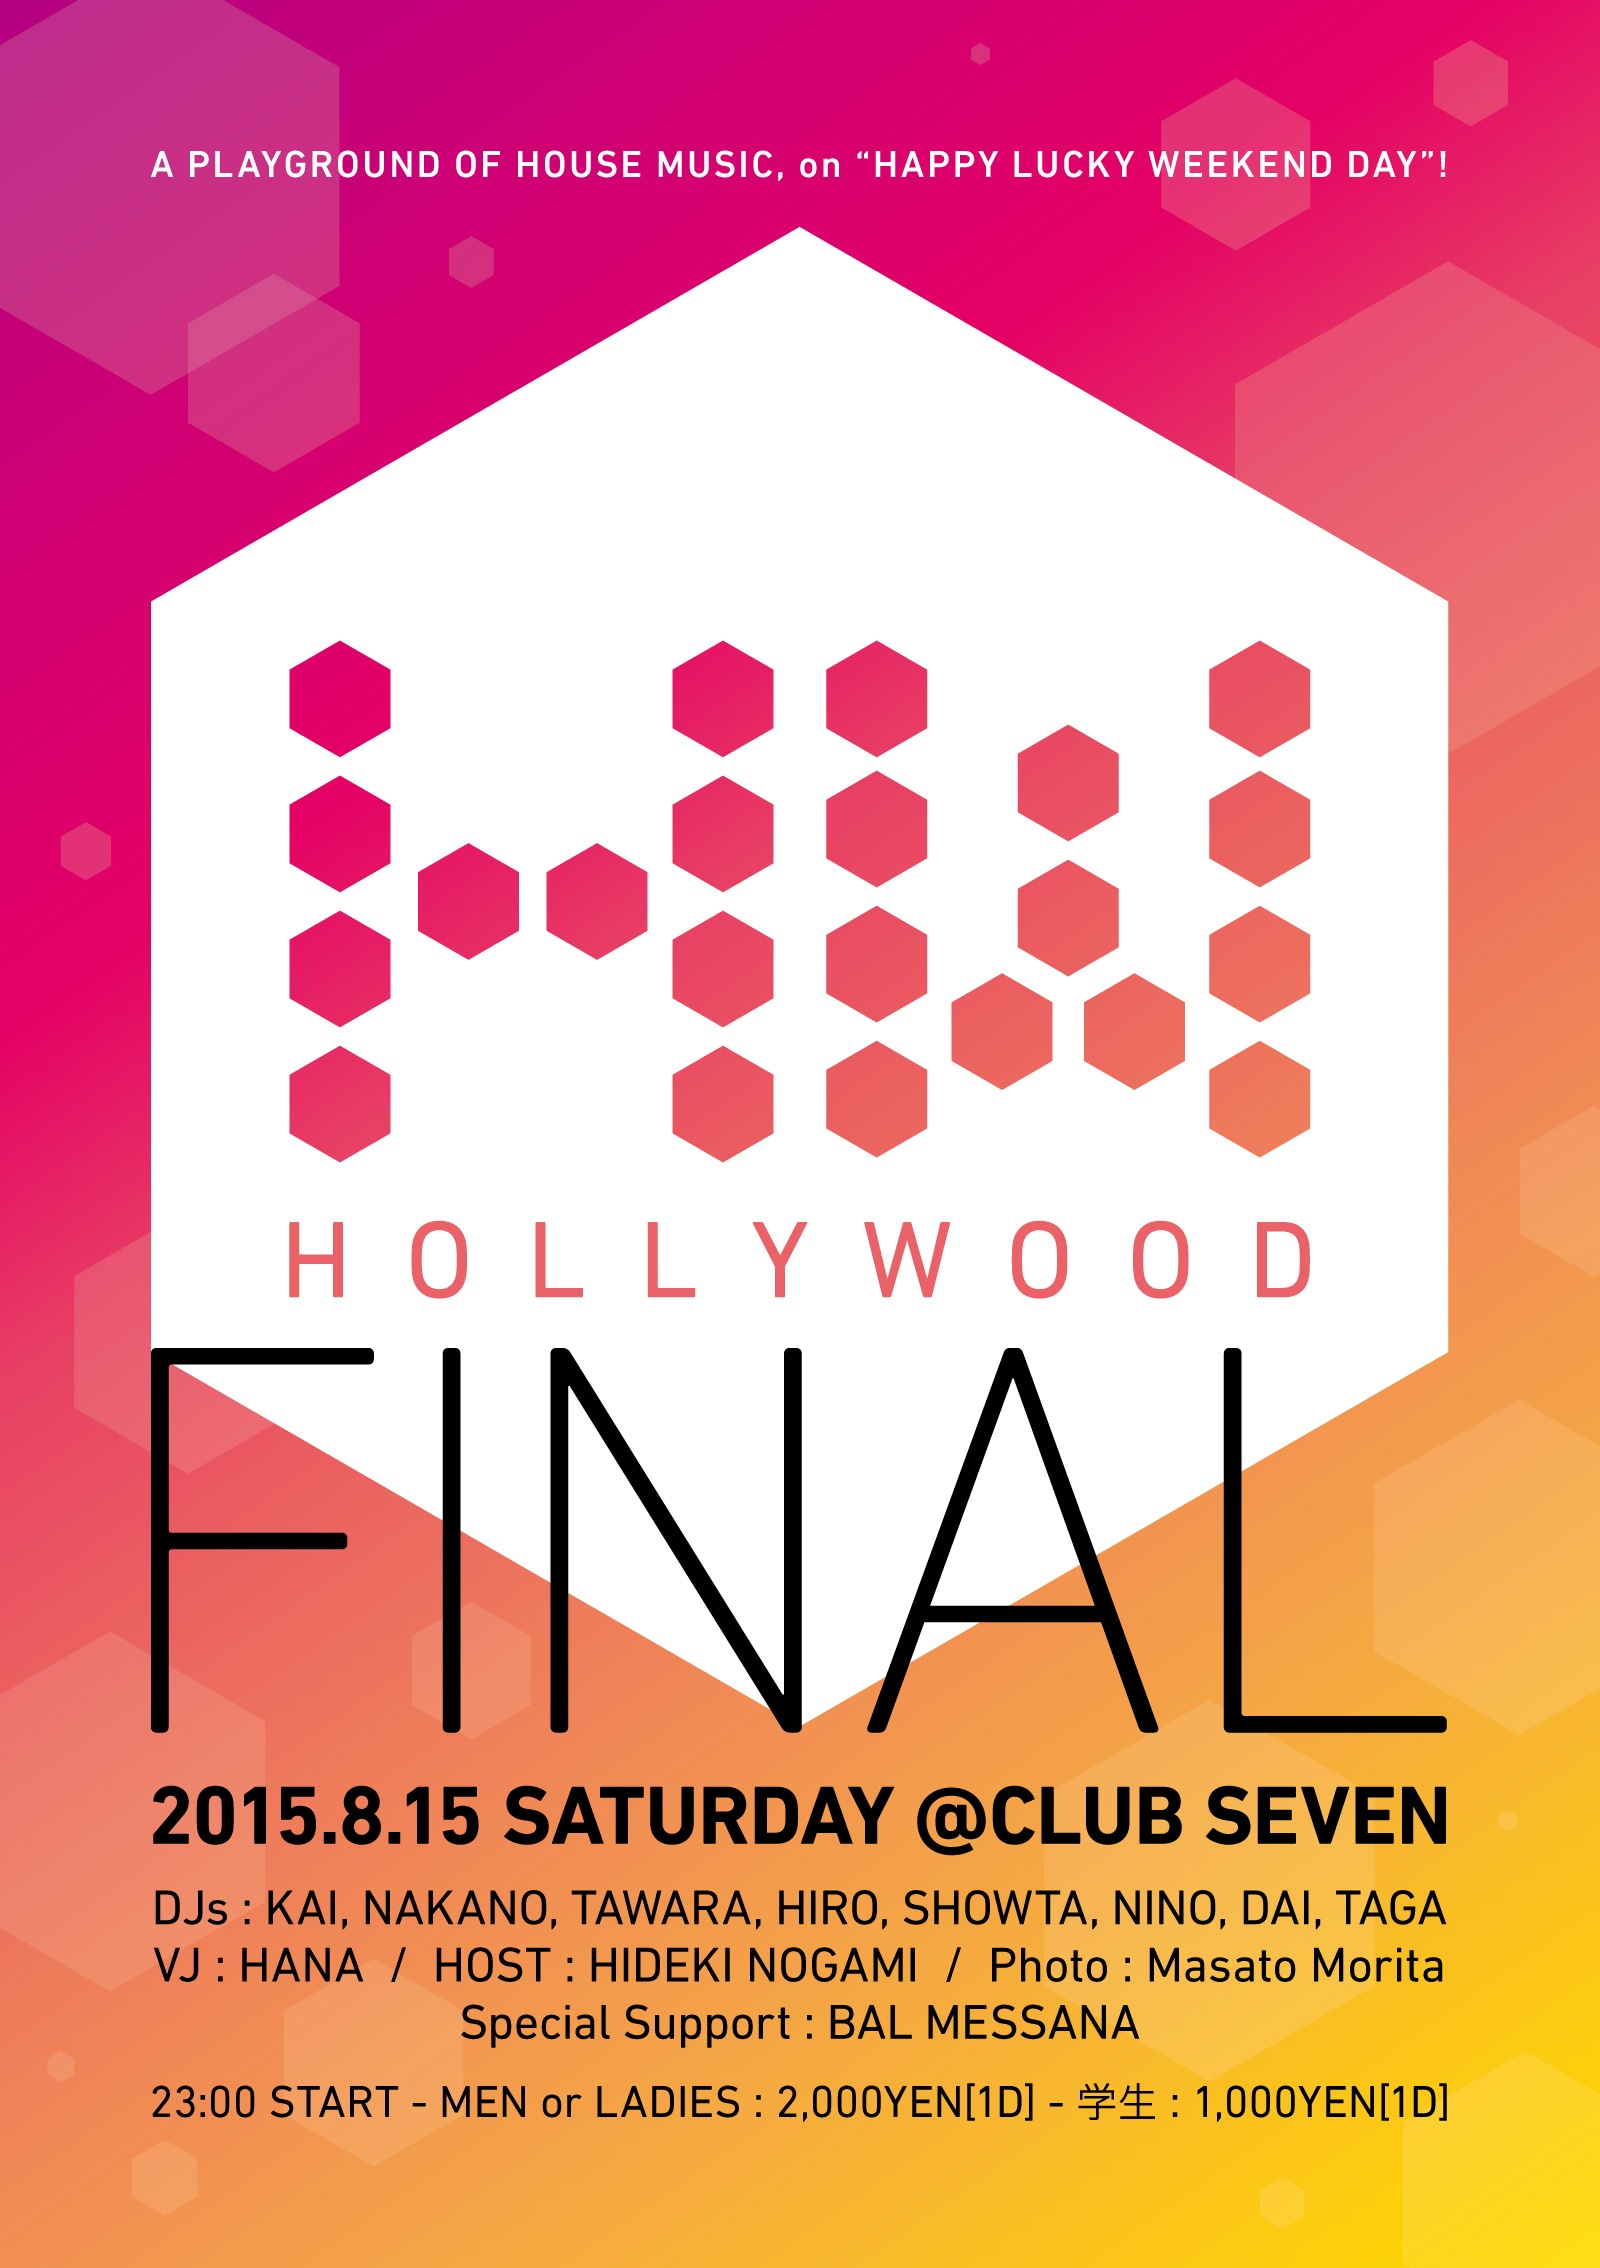 2015.8.15 SAT – KAI & TAWARA : DJ@SEVEN / HOLLYWOOD